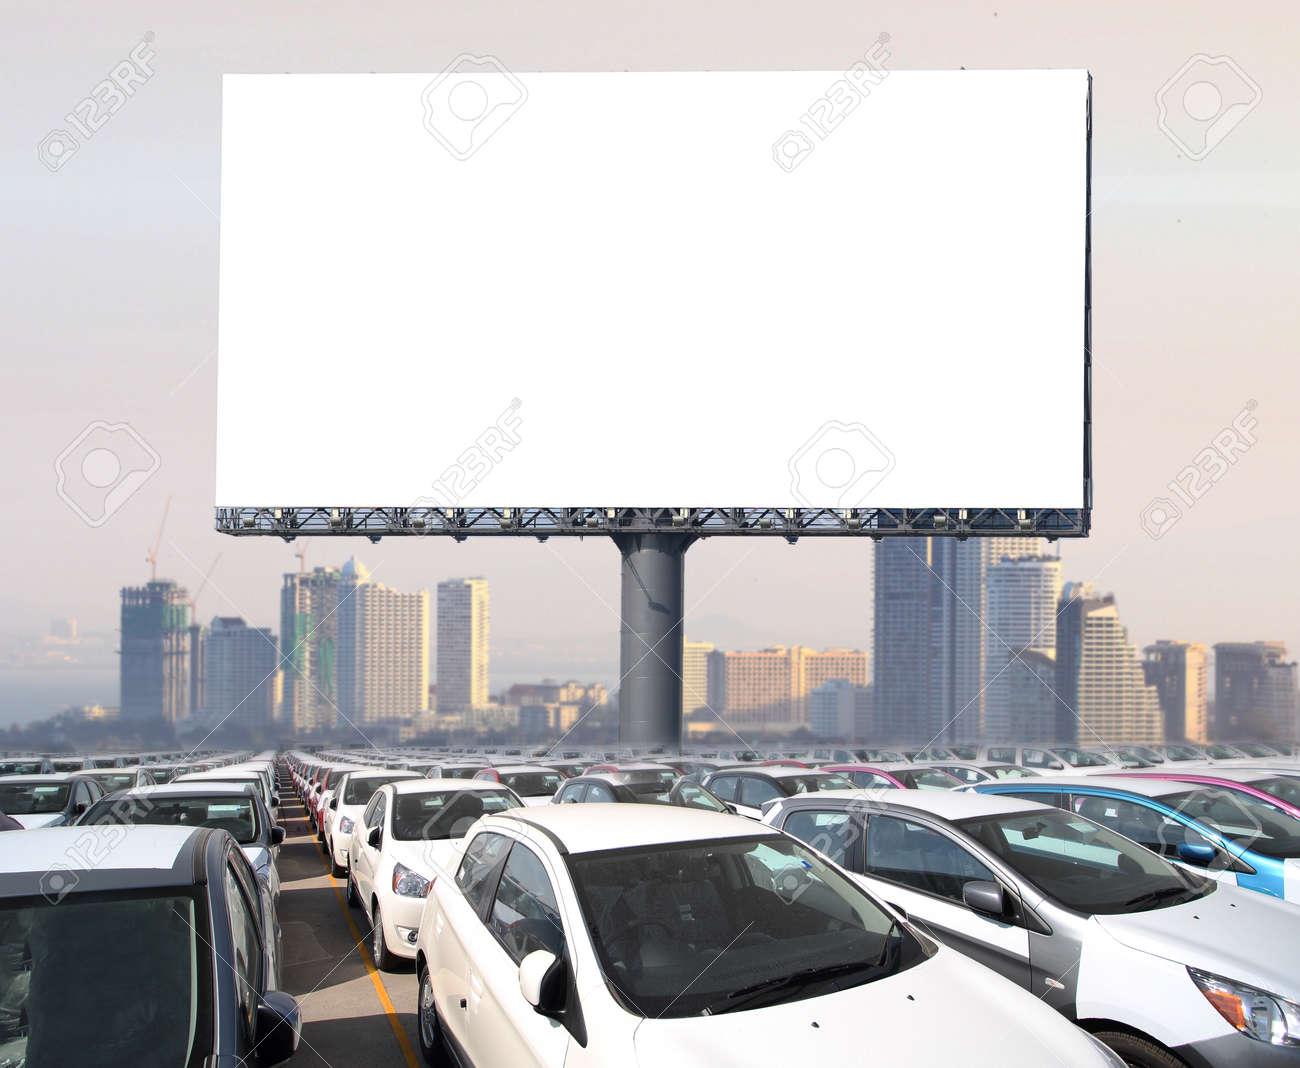 Blank billboard ready for new advertisement - 40644878